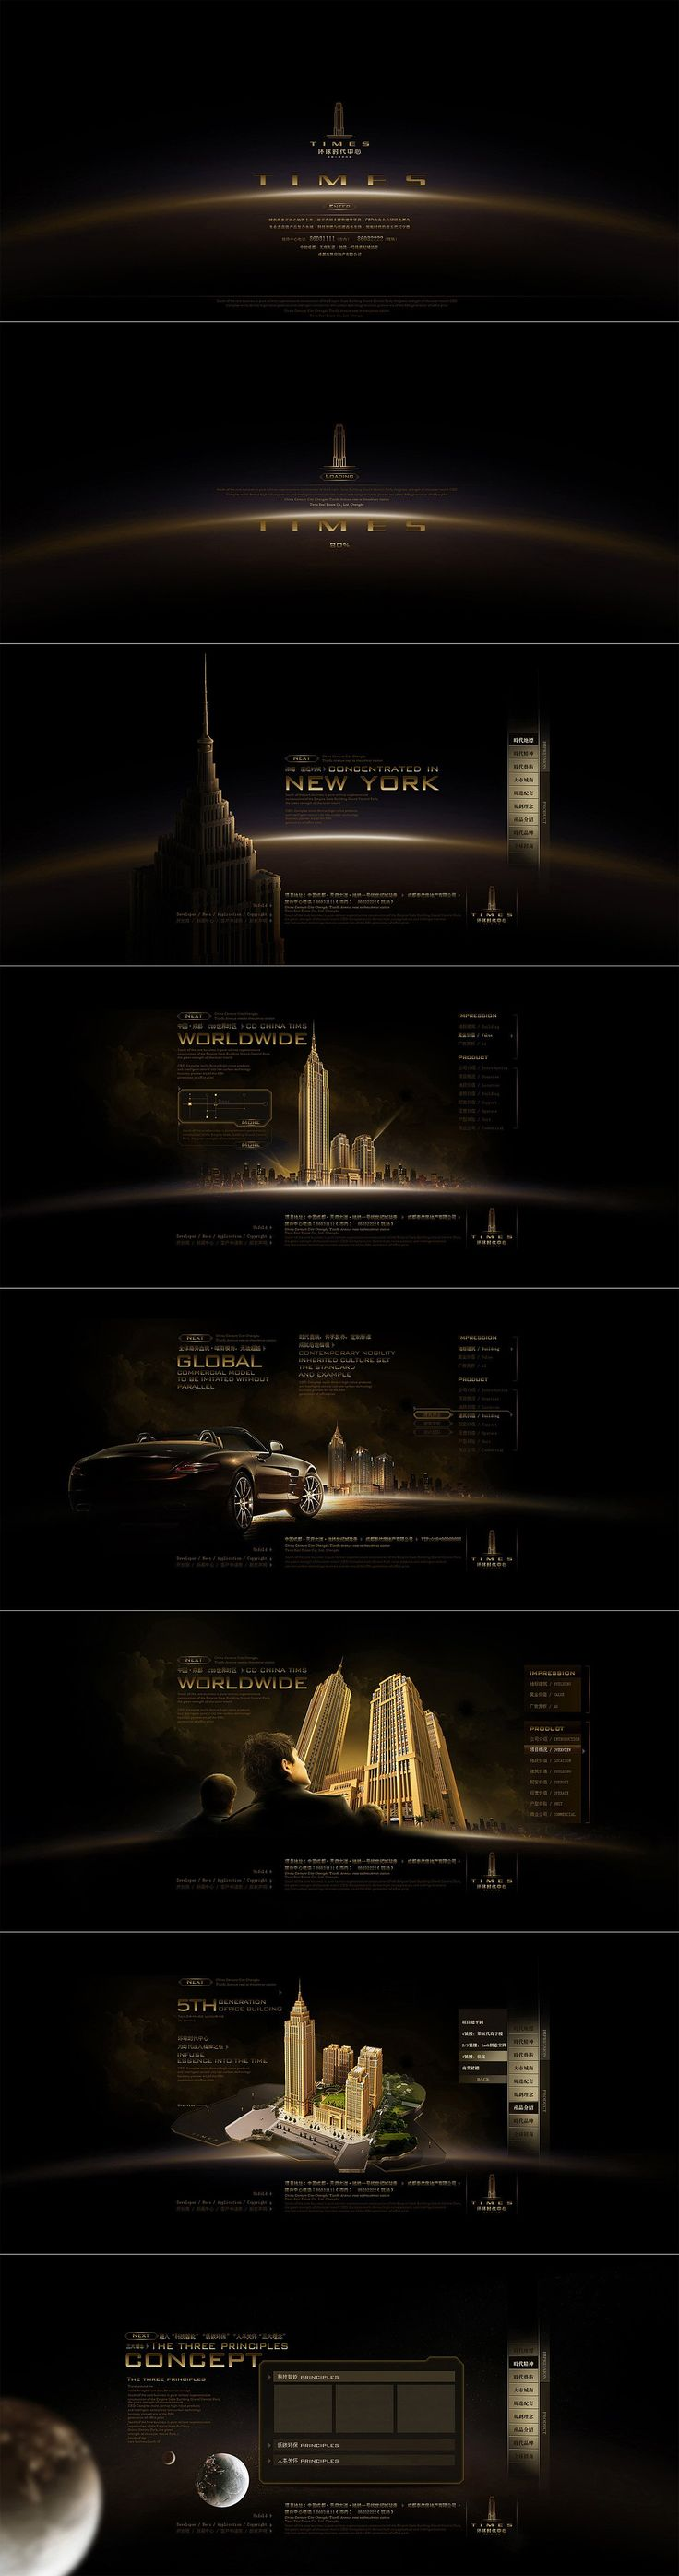 环球时代中心 #wedesign #web #design #layout #userinterface #website < repinned by Alexander Kaiser   visit www.kaiser-alexander.de